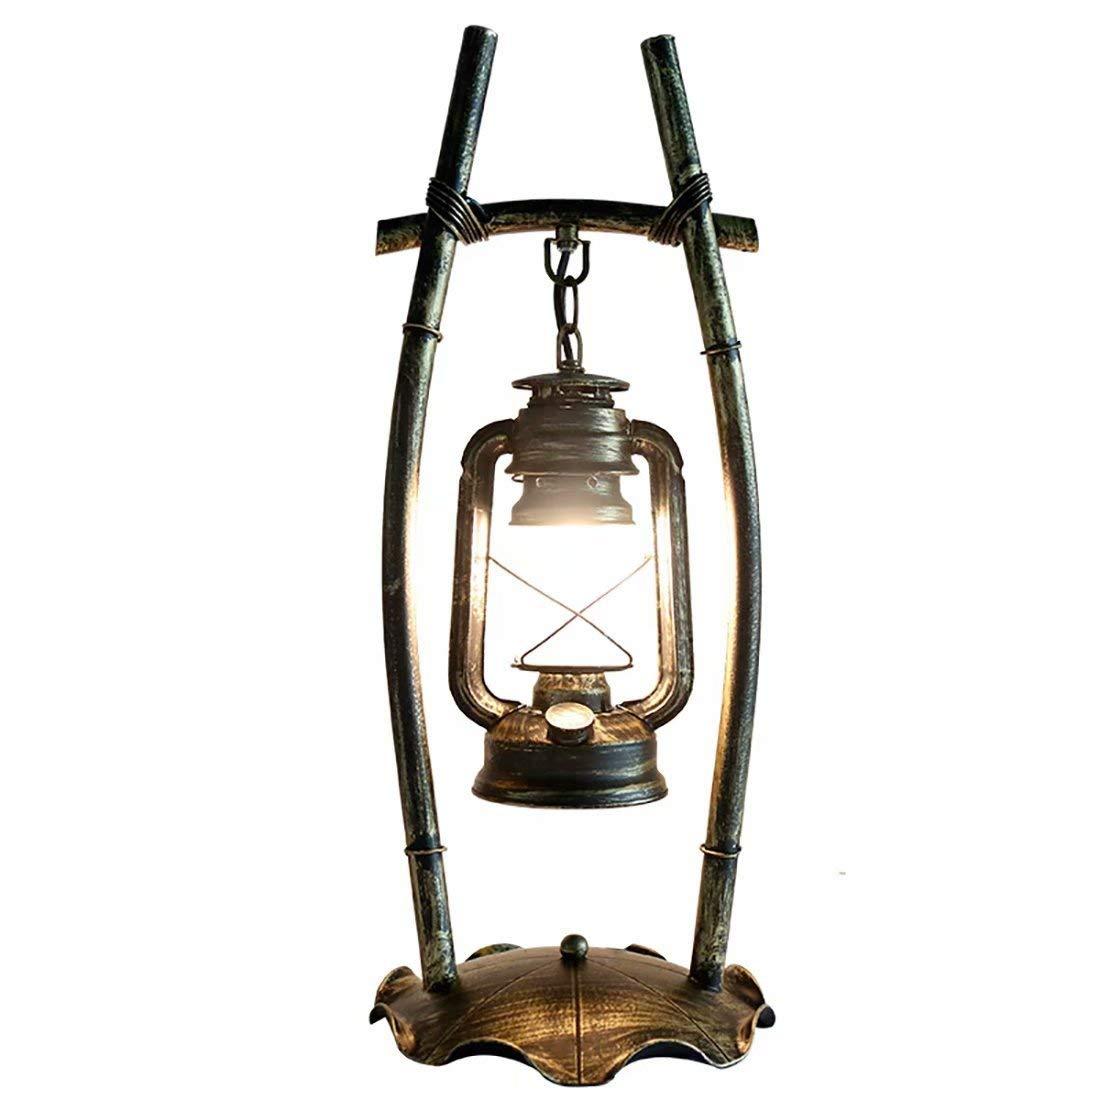 Vintage Wrought Iron LED Table Lamp Personality Bedroom Study Room Restaurant Retro Wrought Iron Kerosene Lamp Creative Art Antique Table Lamp